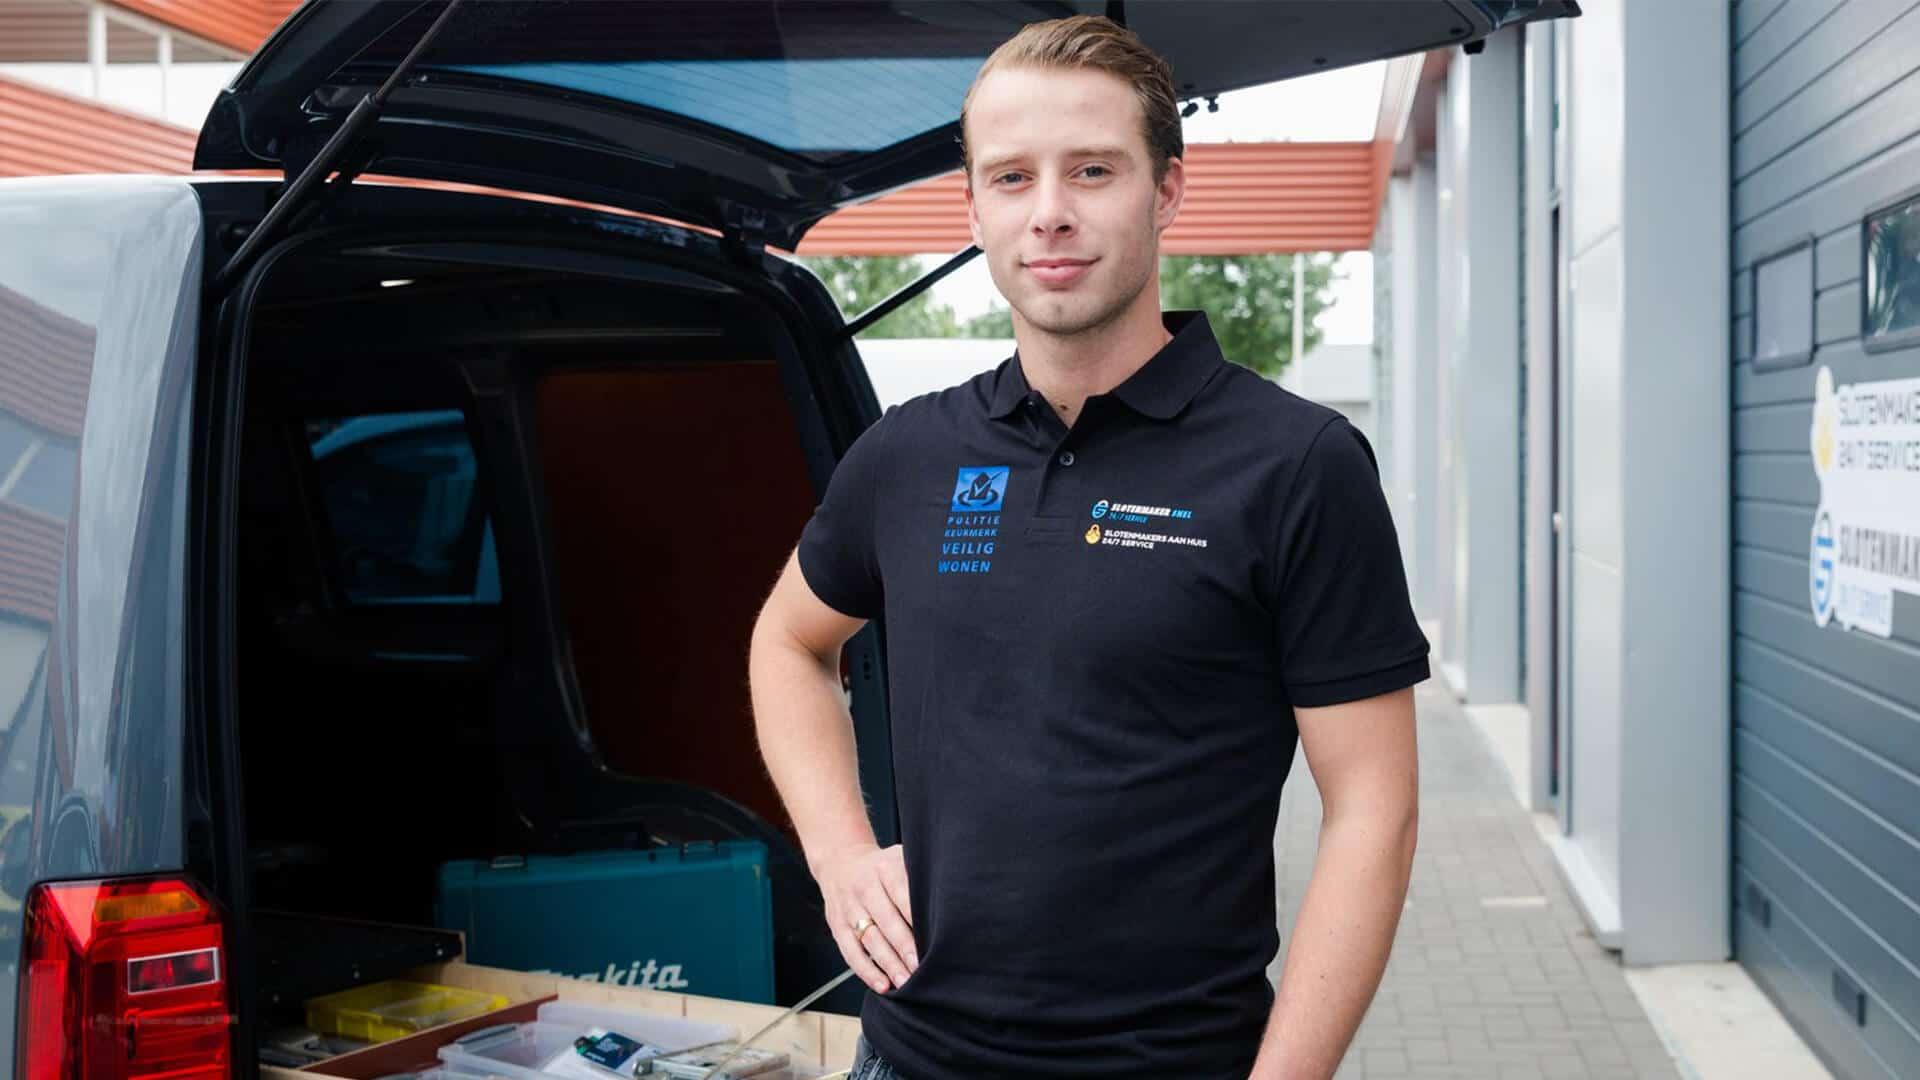 Slotenmaker Maarssen